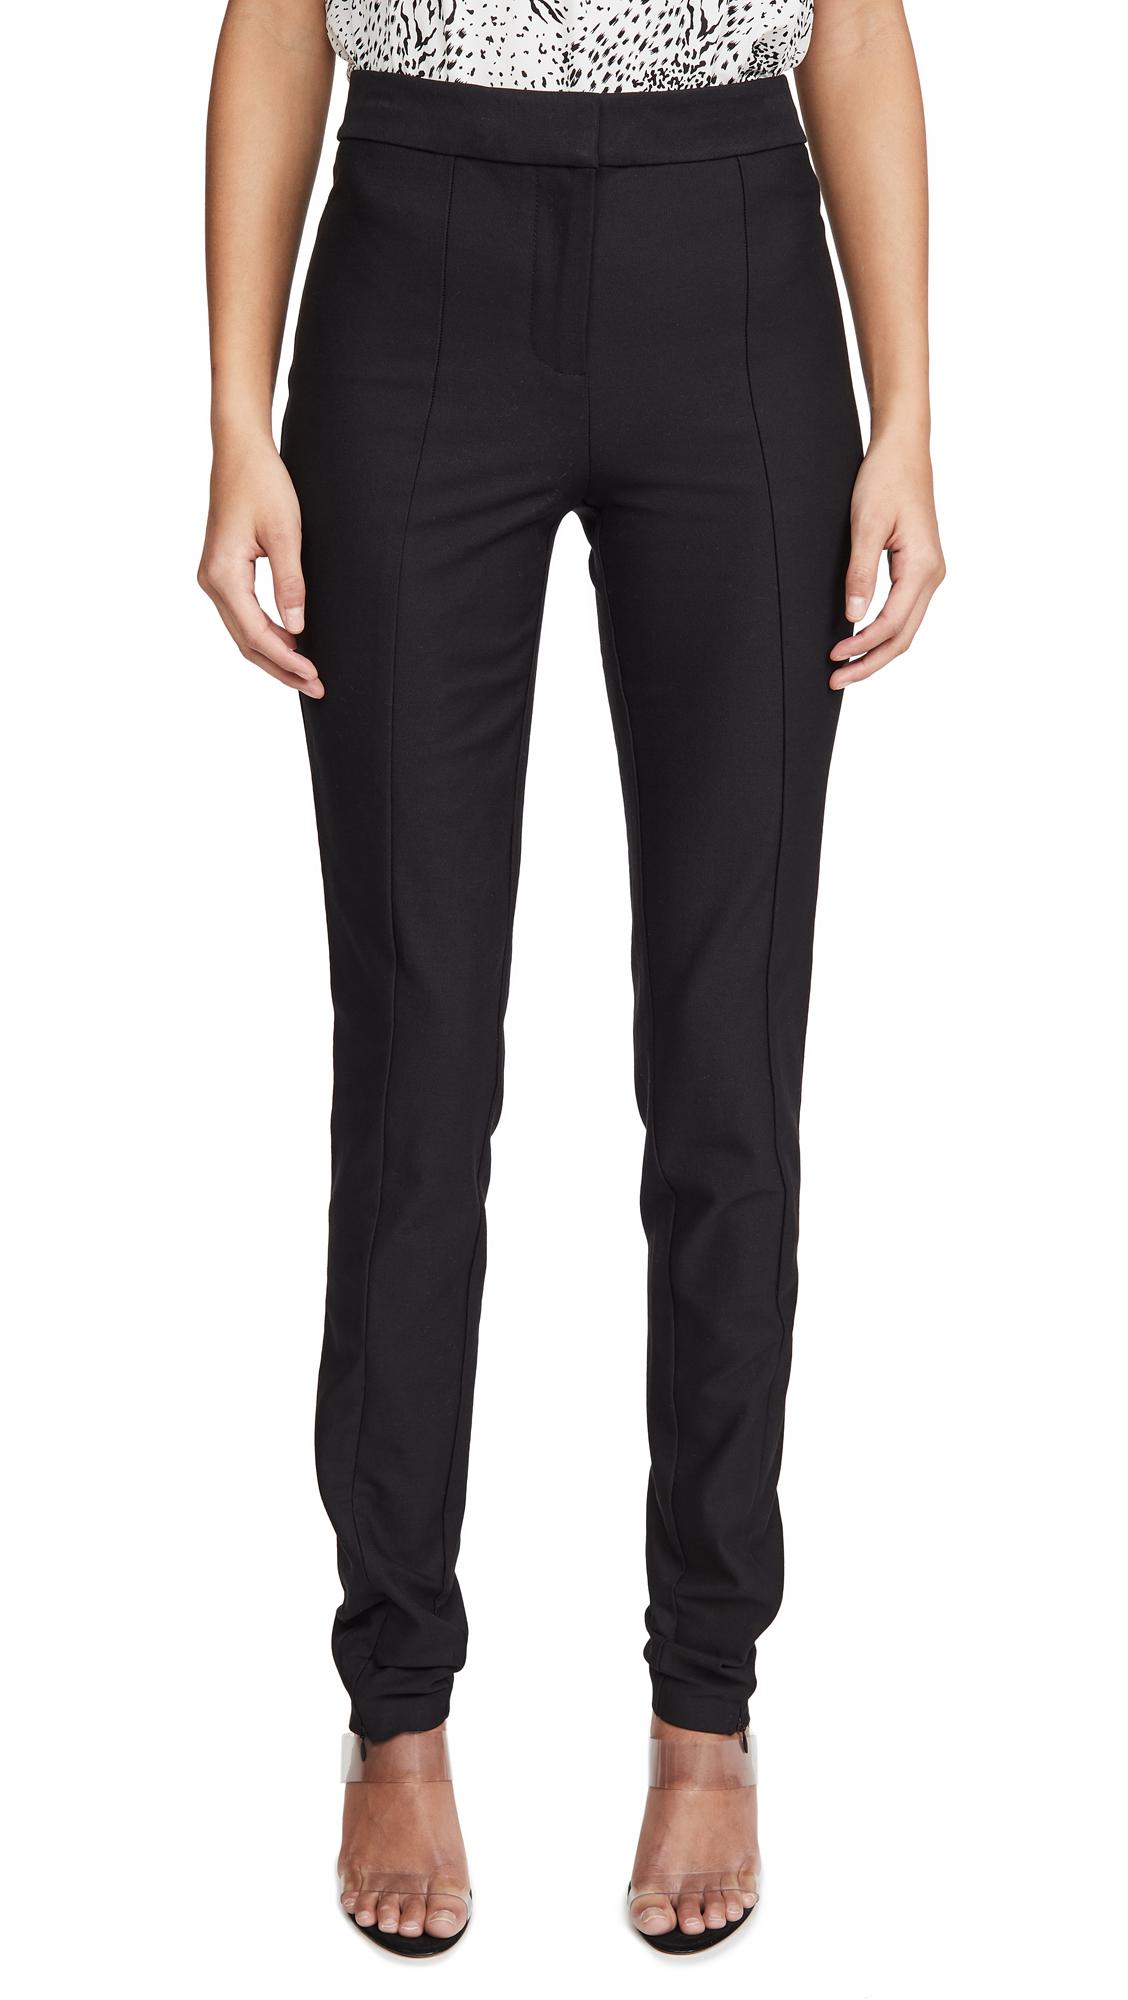 Derek Lam 10 Crosby Ora Slim Trousers with Front Slit